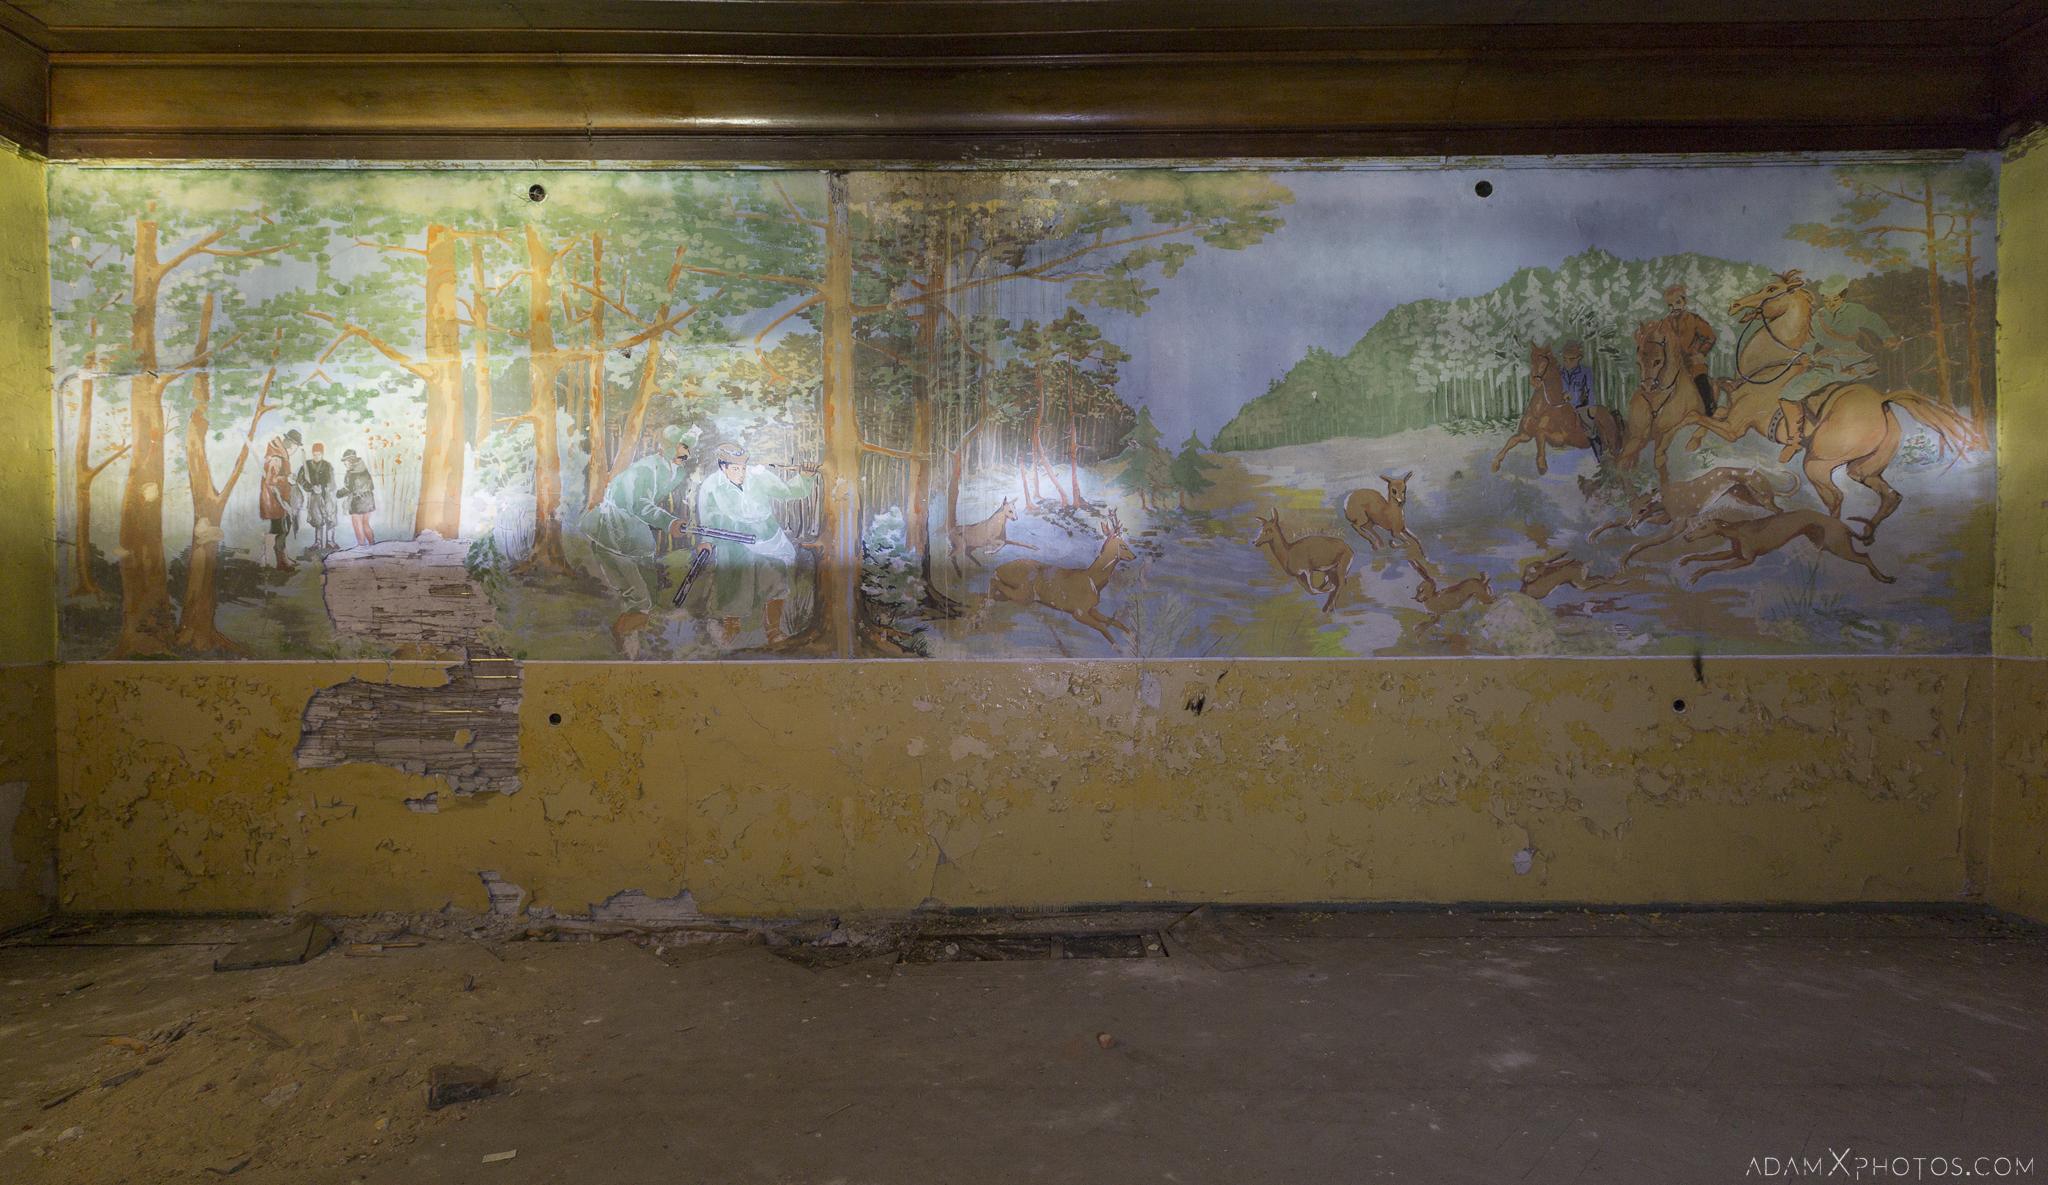 Mural hunting scene woodland Hunter's castle Moja Wola Pałac Myśliwski w Mojej Woli Urbex Poland Adam X Urban Exploration Access 2016 Abandoned decay lost forgotten derelict location haunting eerie